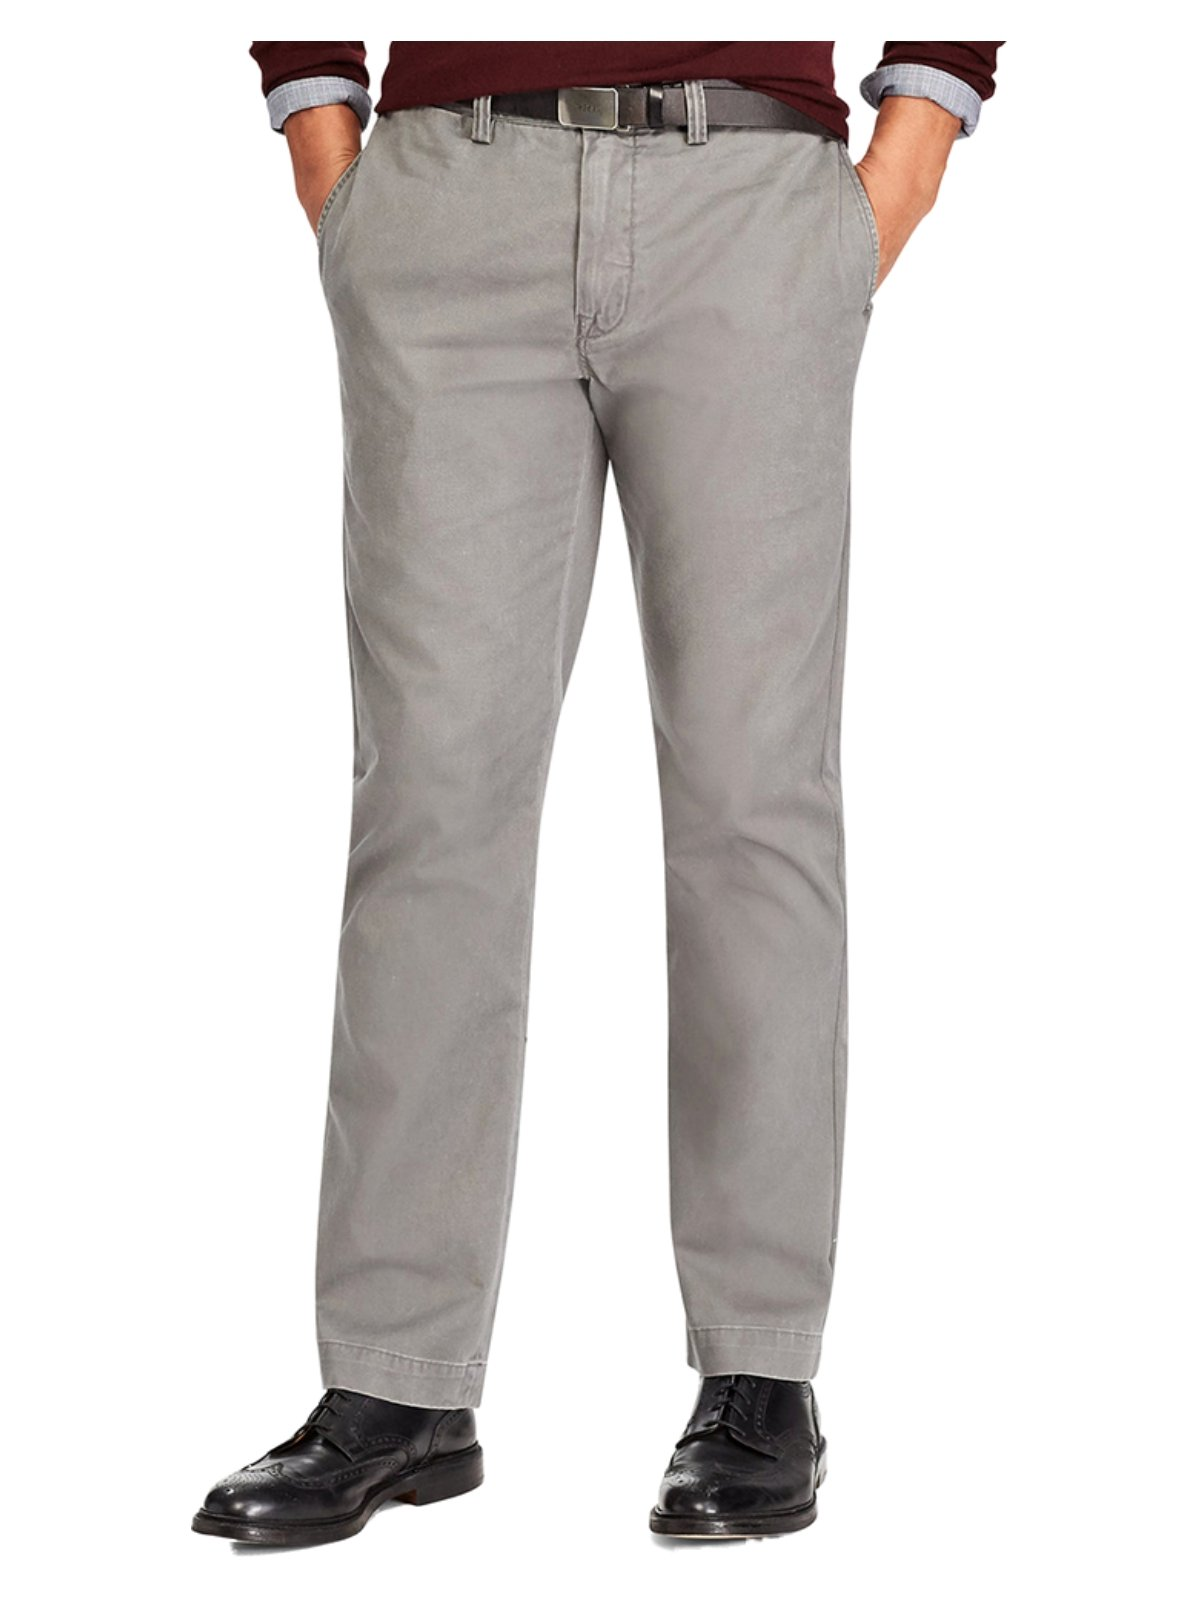 Polo Ralph Lauren Men's Big & Tall Classic Fit Chino Pants 46B x 34L Grey